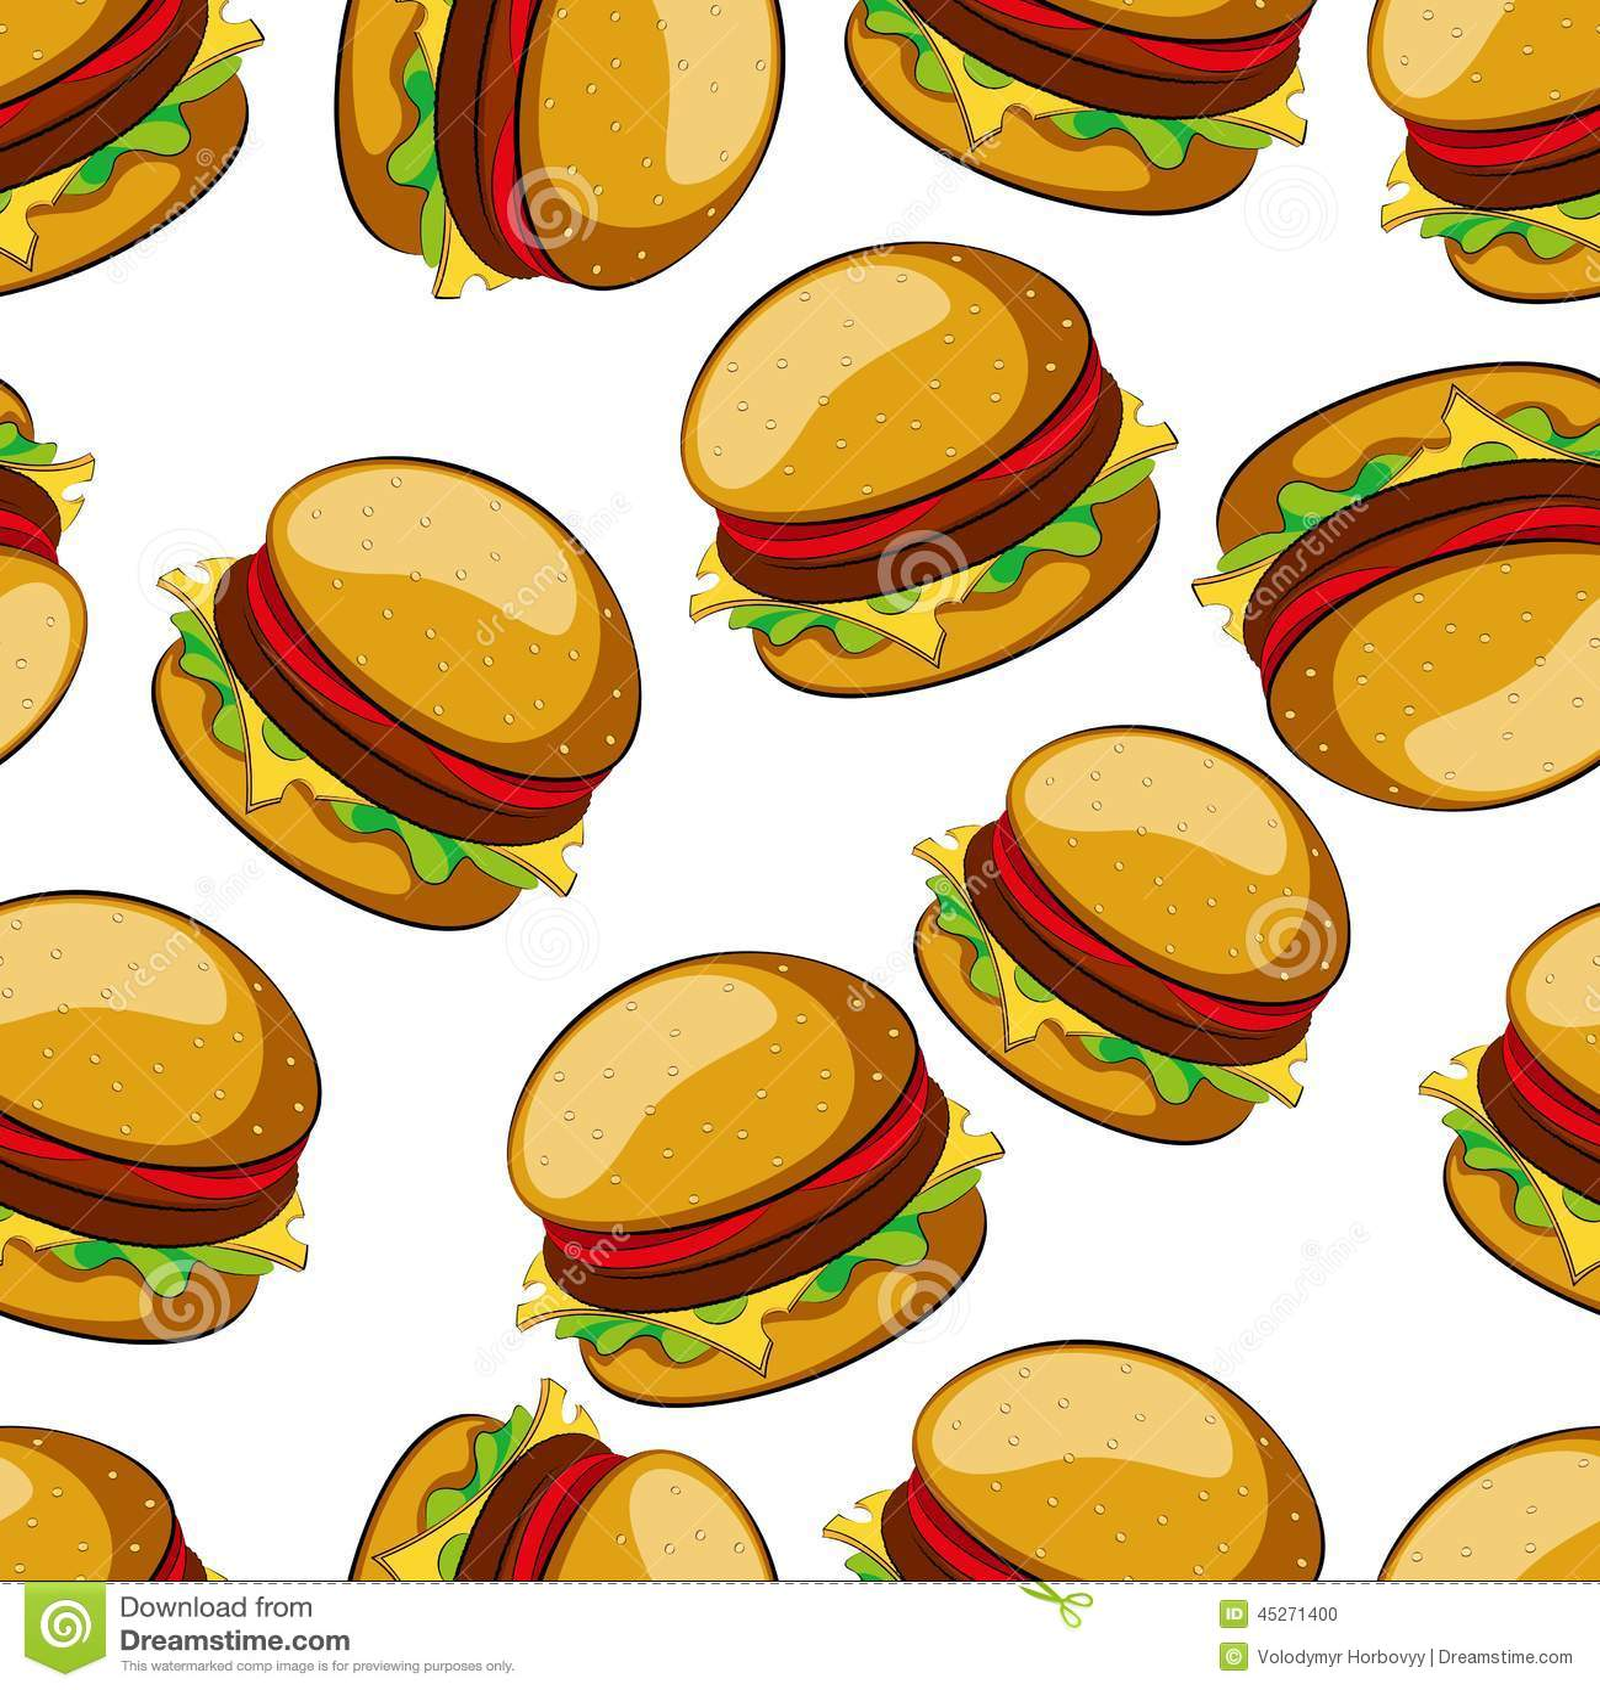 Hamburger Stock Vector - Image: 45271400